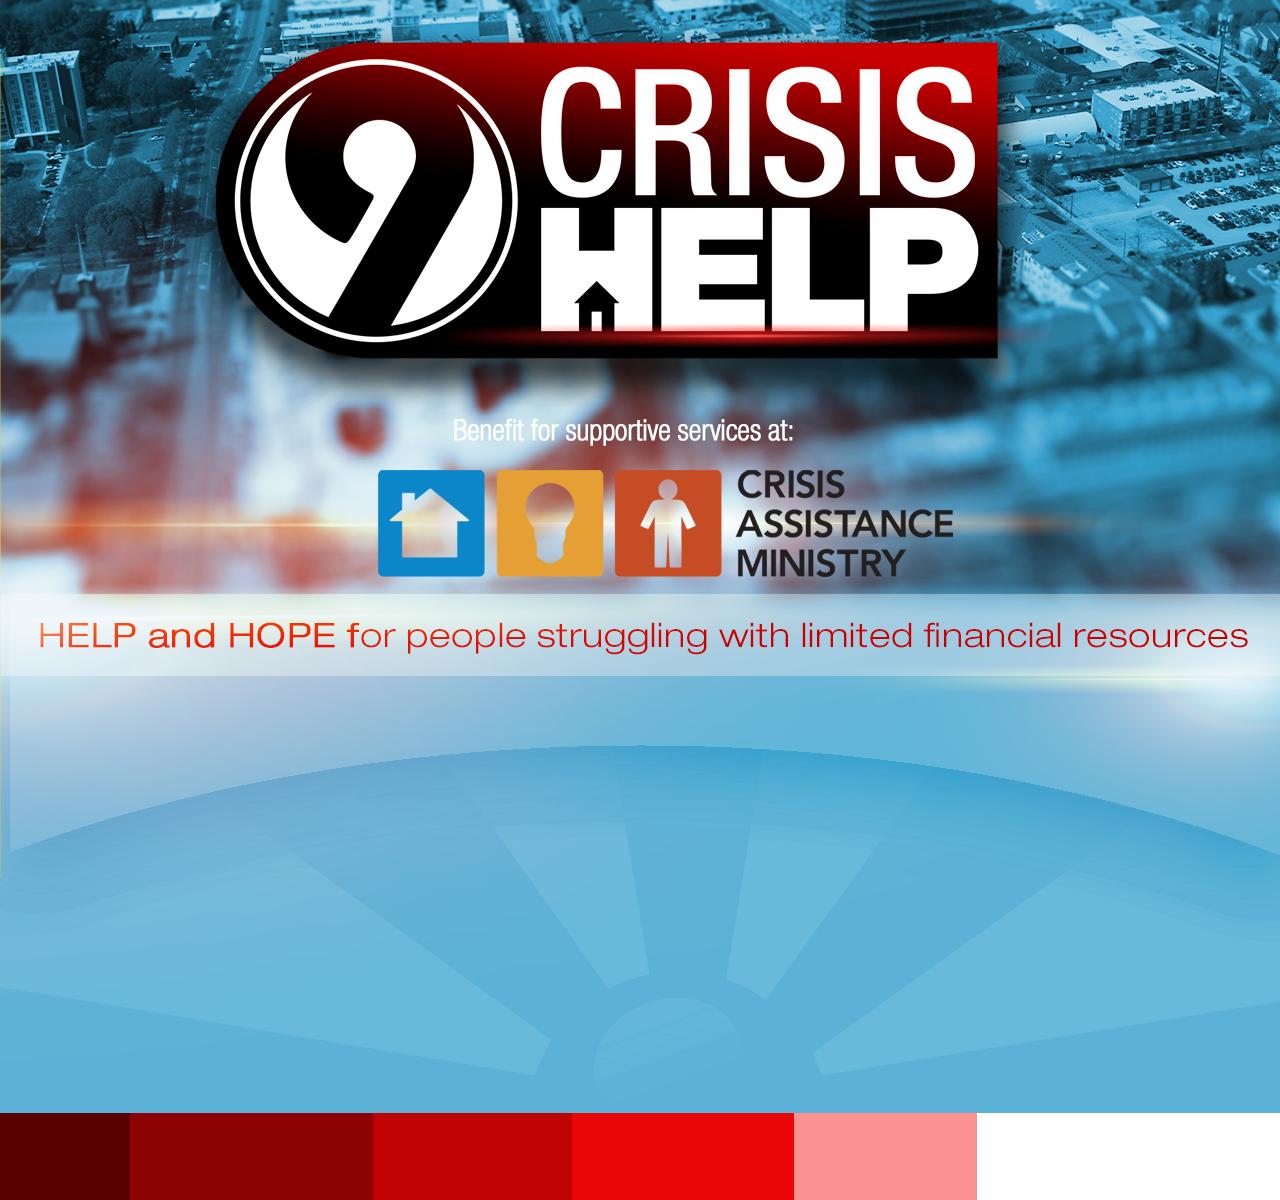 9 Crisis Help